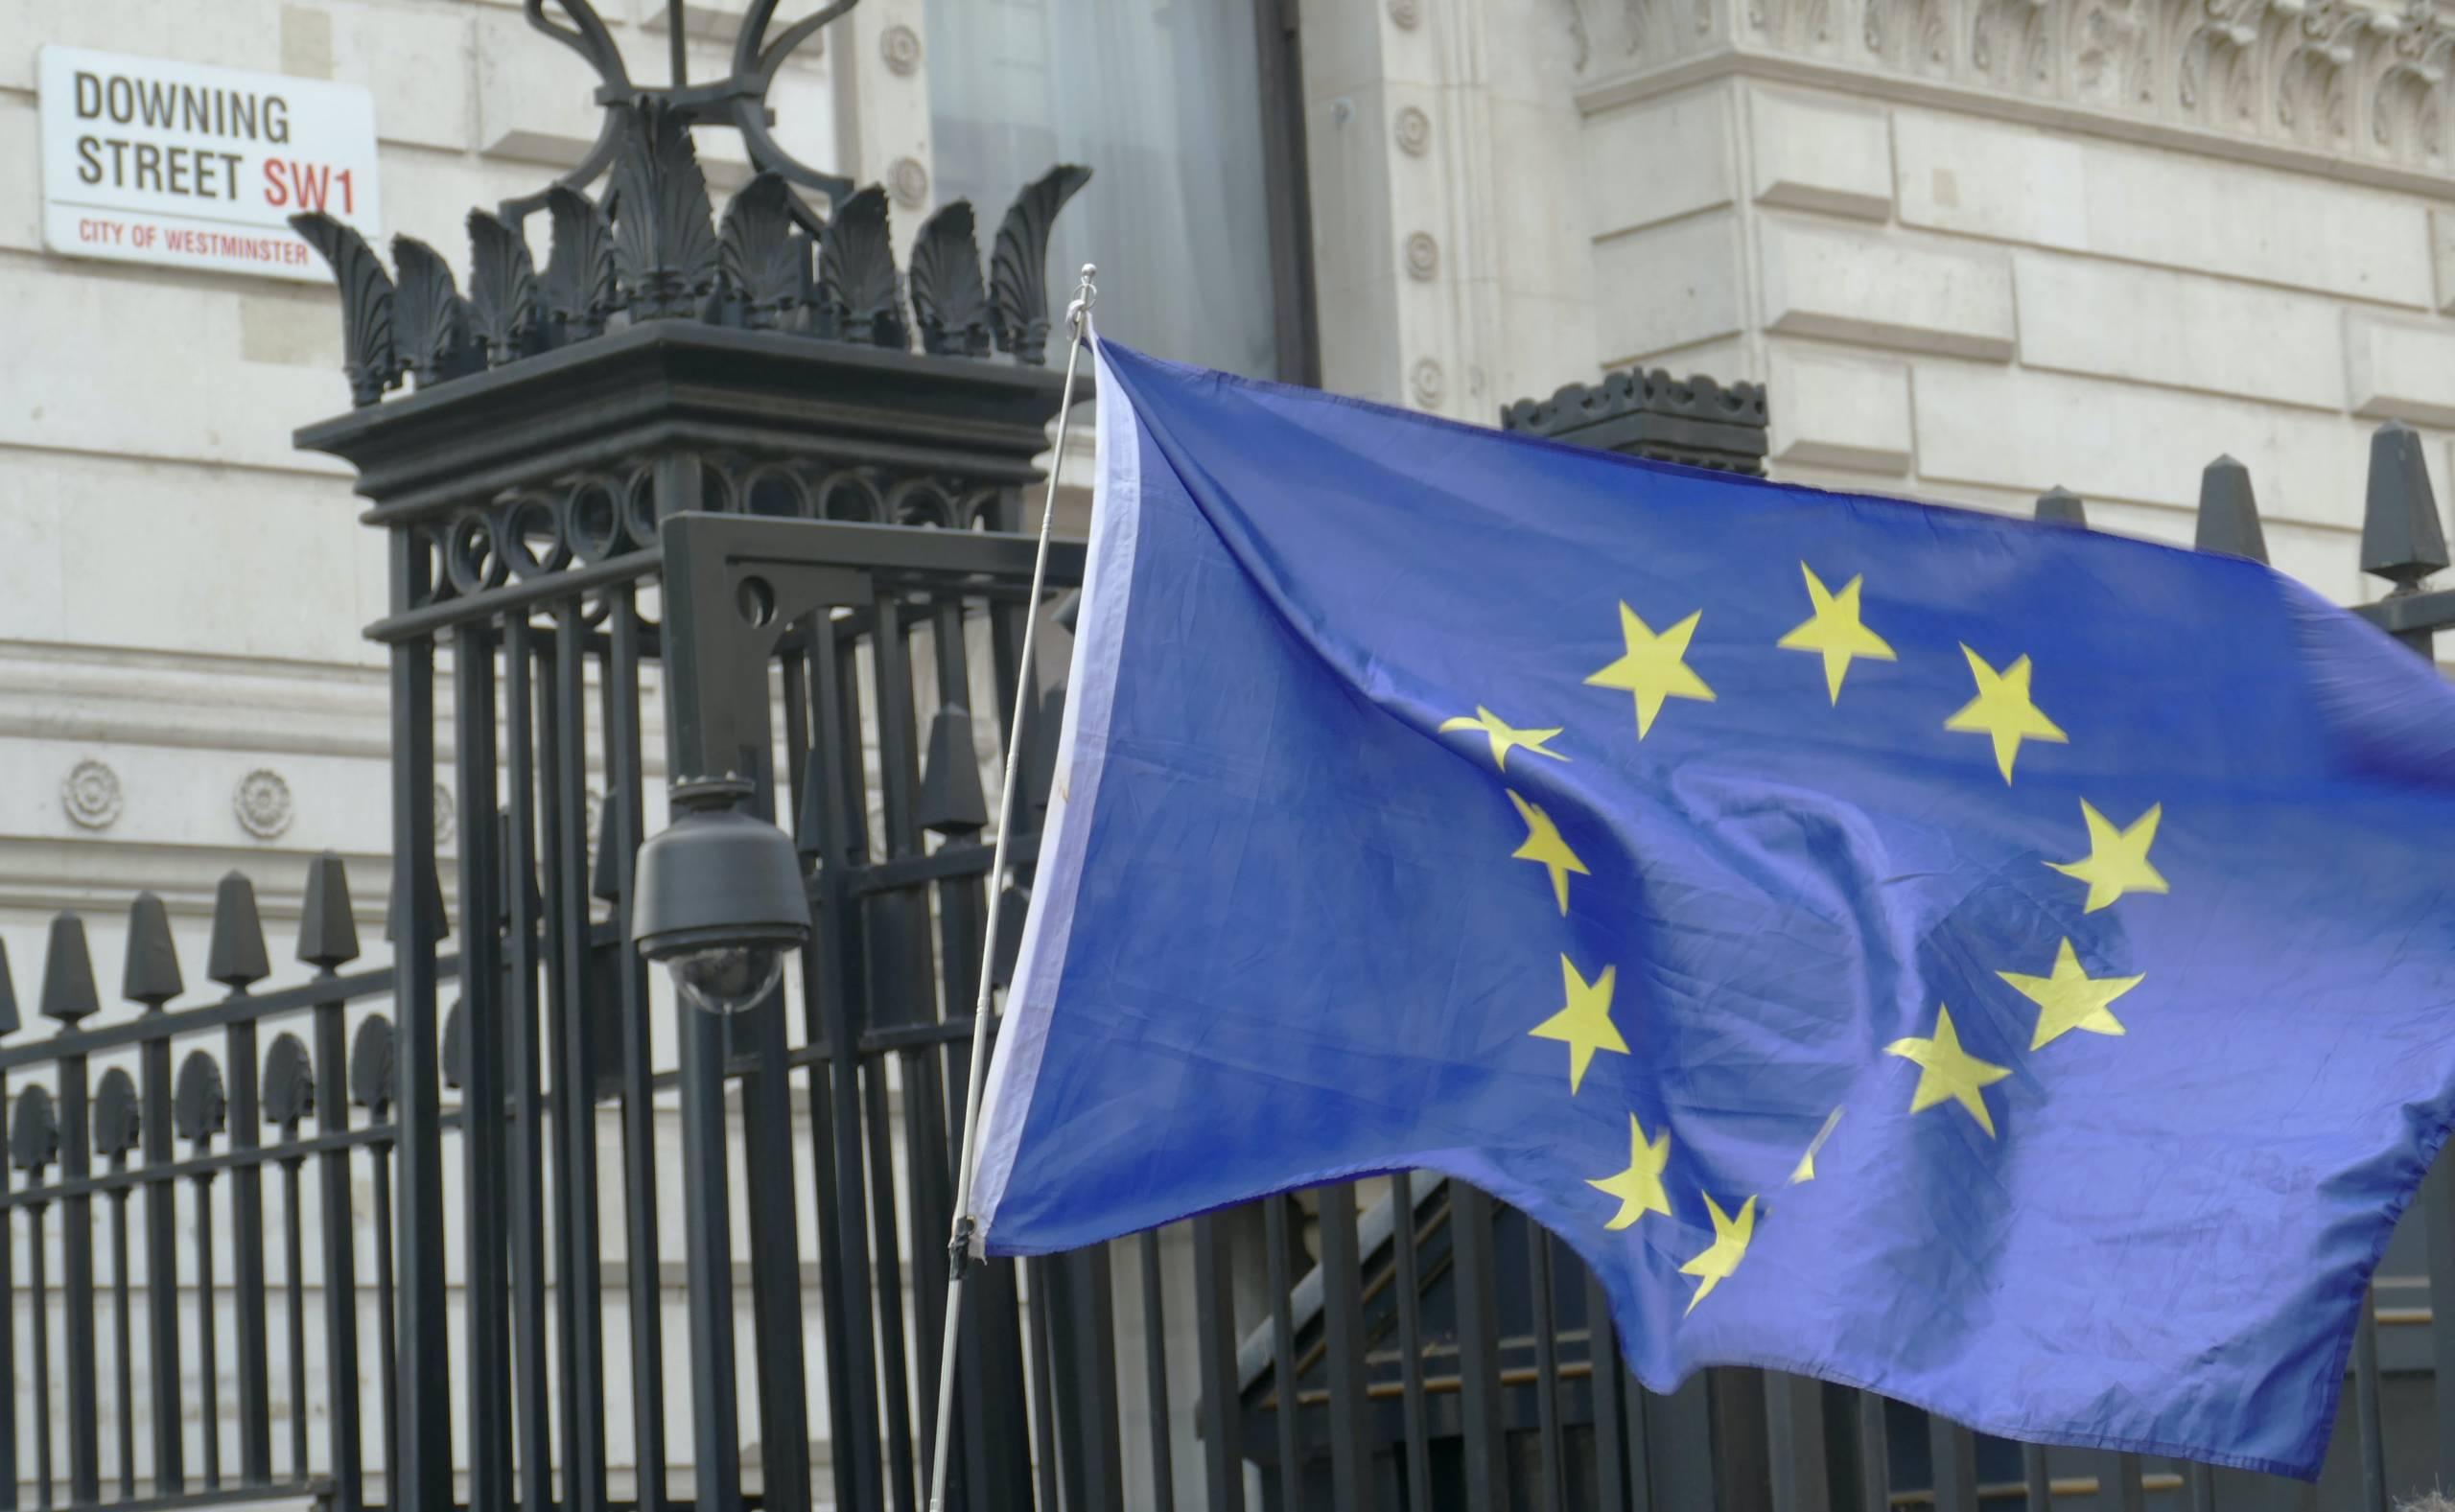 PN decries lack of progress on Malta's recovery plan